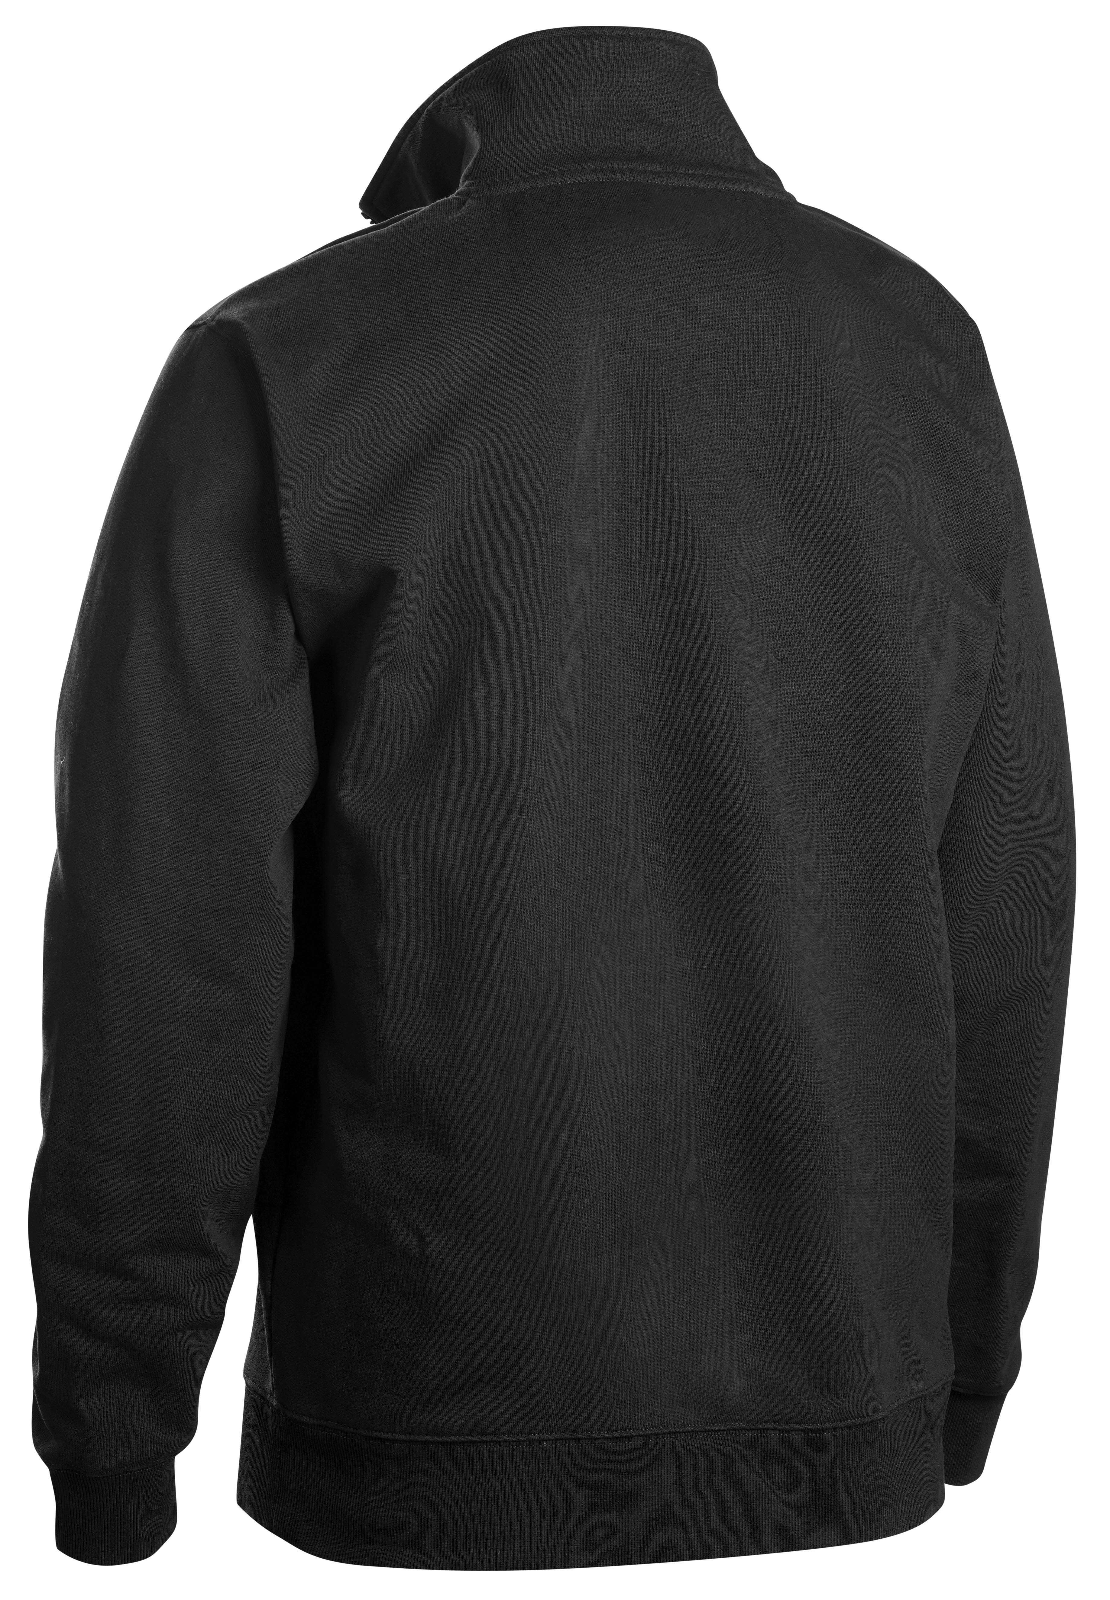 Blaklader Truien 33531158 zwart-grijs(9994)